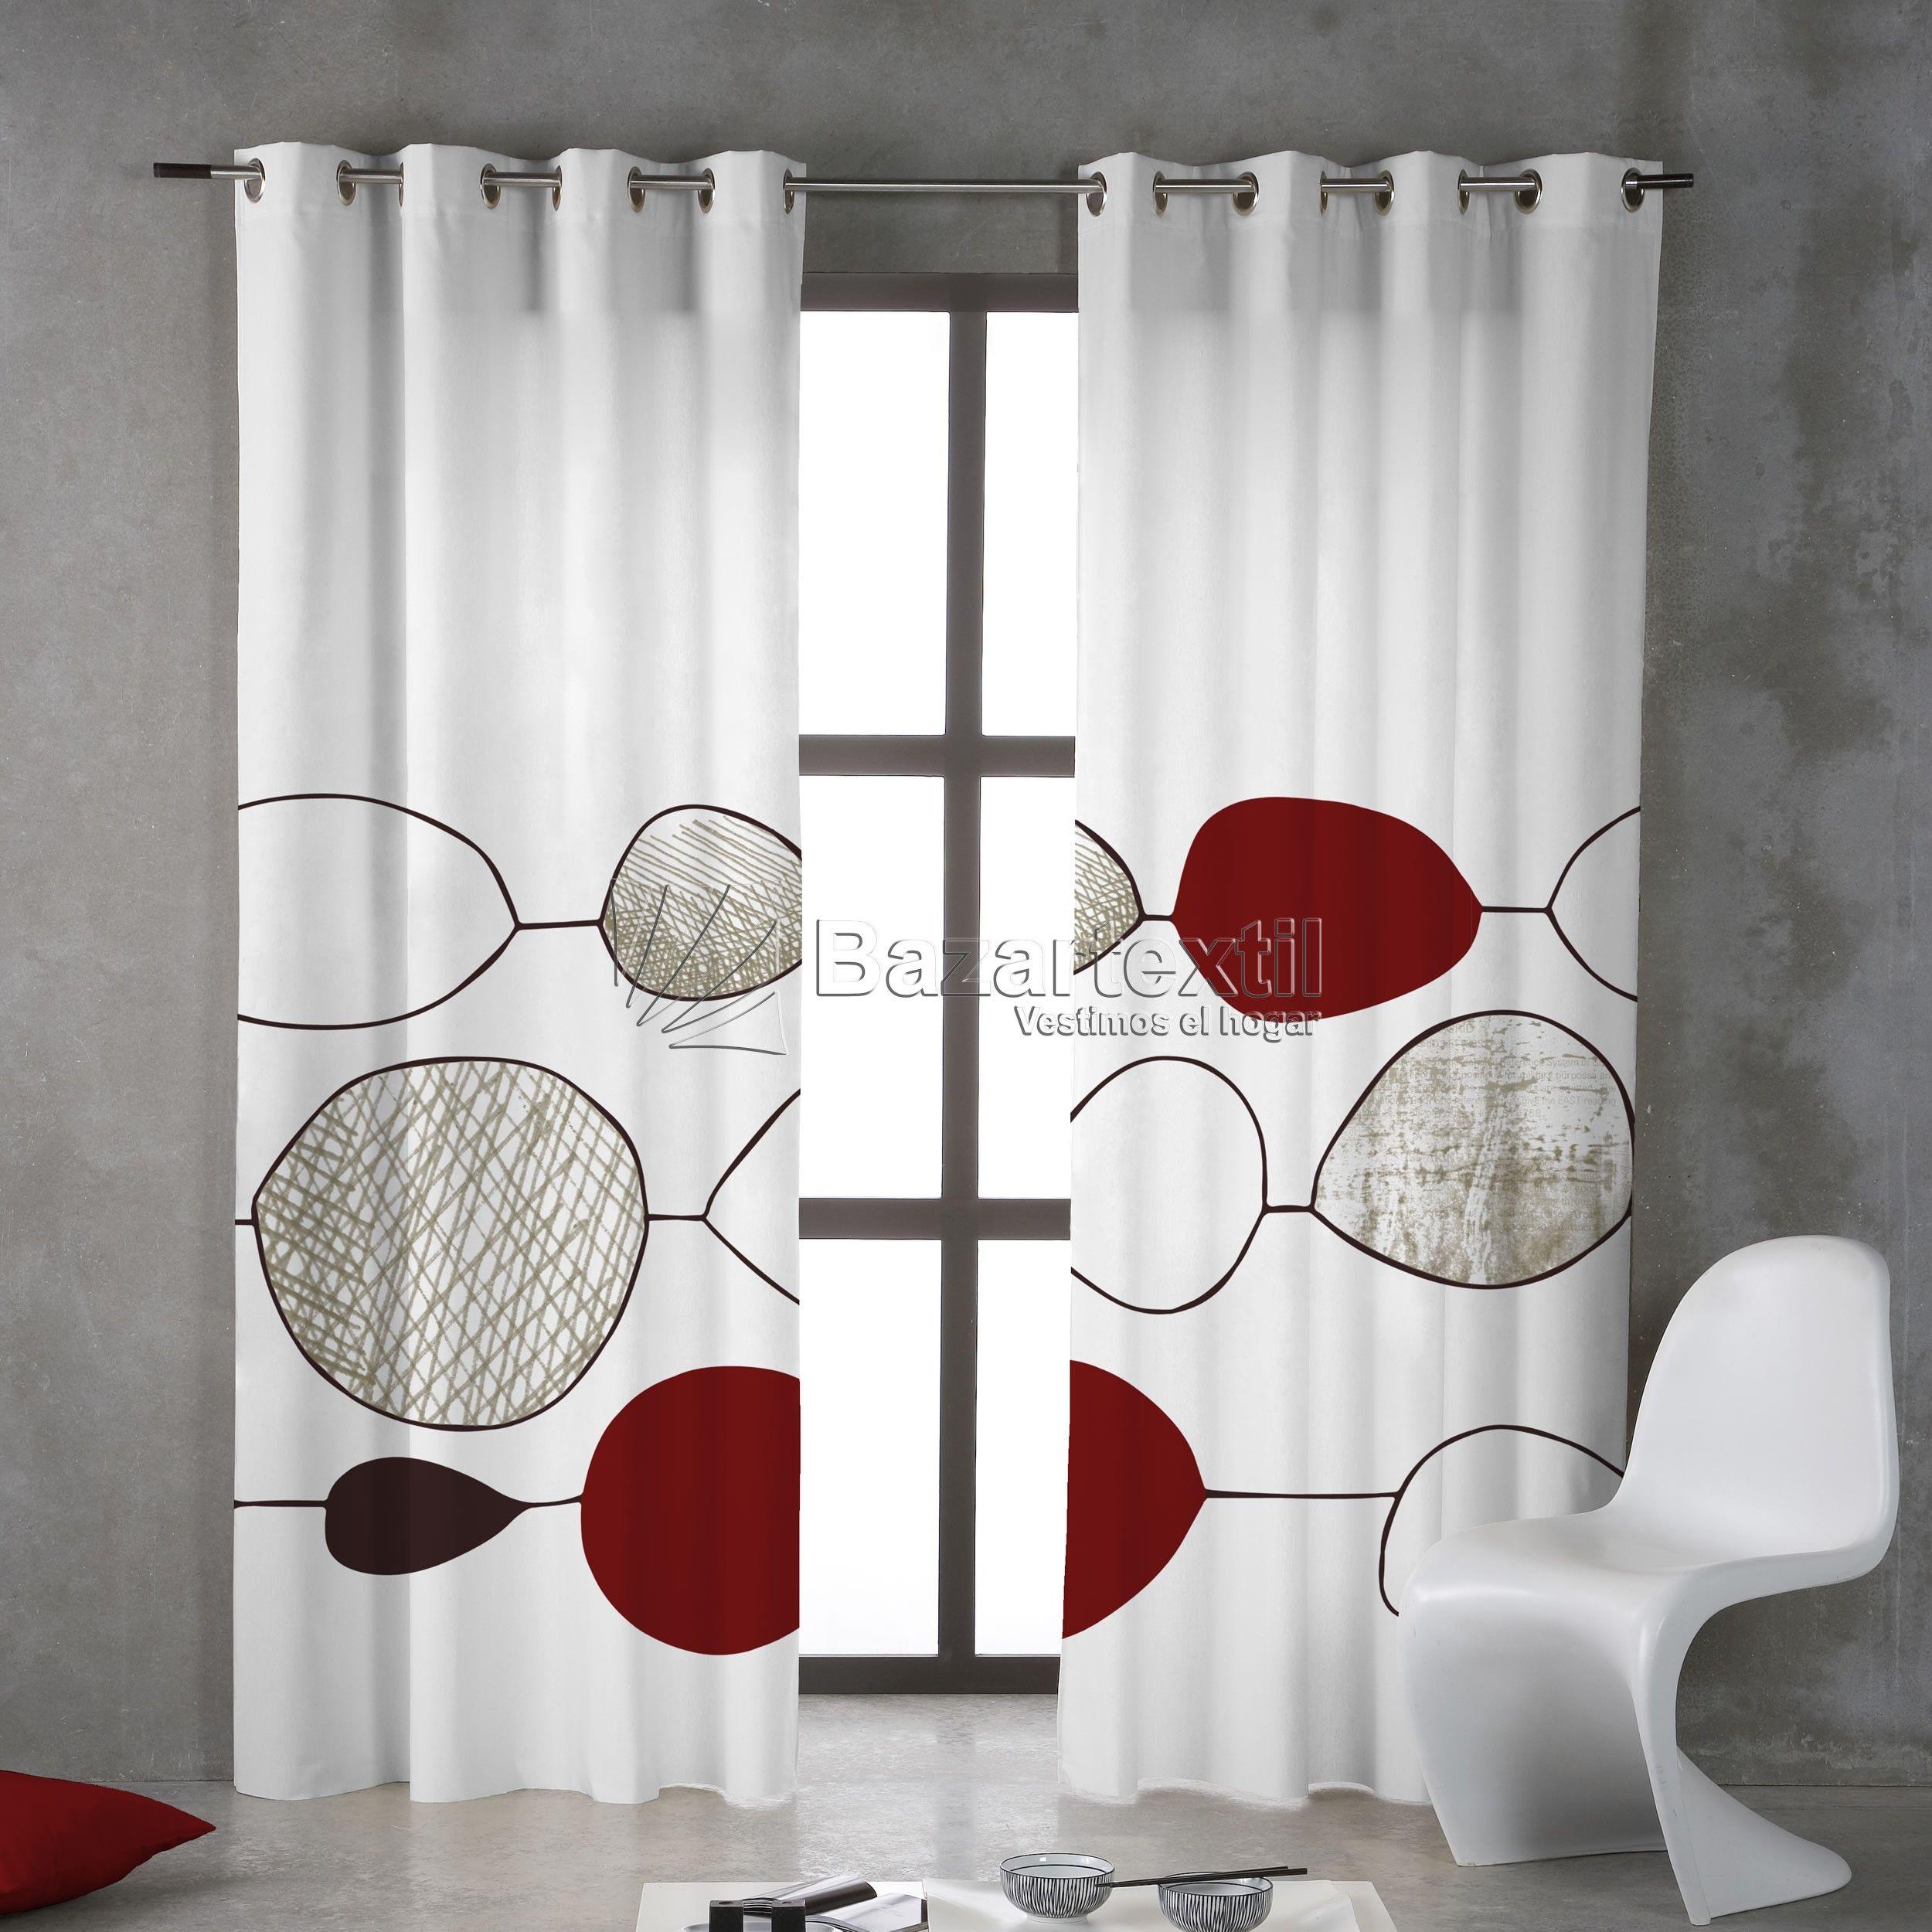 Estilo moderno para cortinas | Ideas para el hogar | Pinterest ...